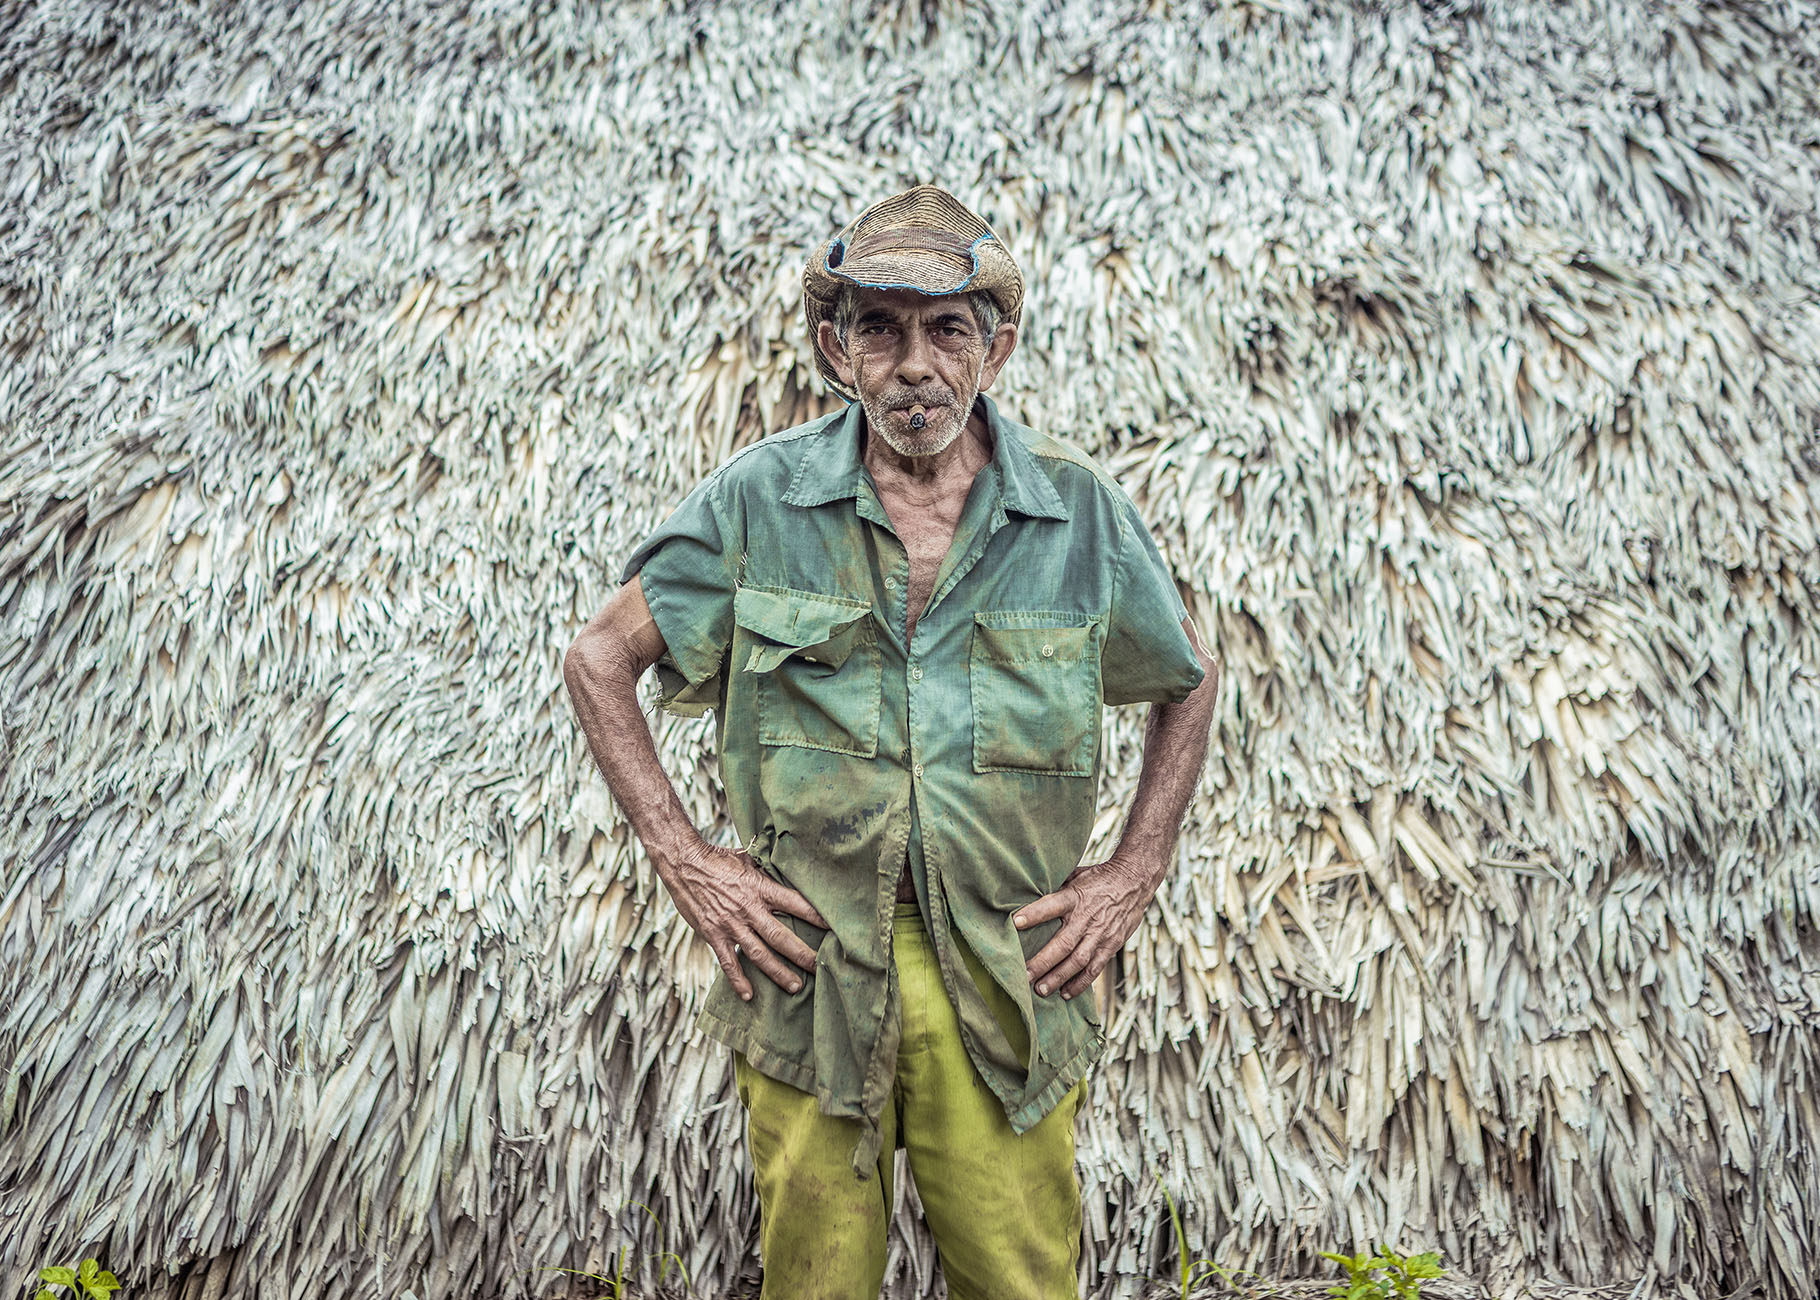 Alejandro_Perez_Cuba_West_Farmer_Portrait.jpg